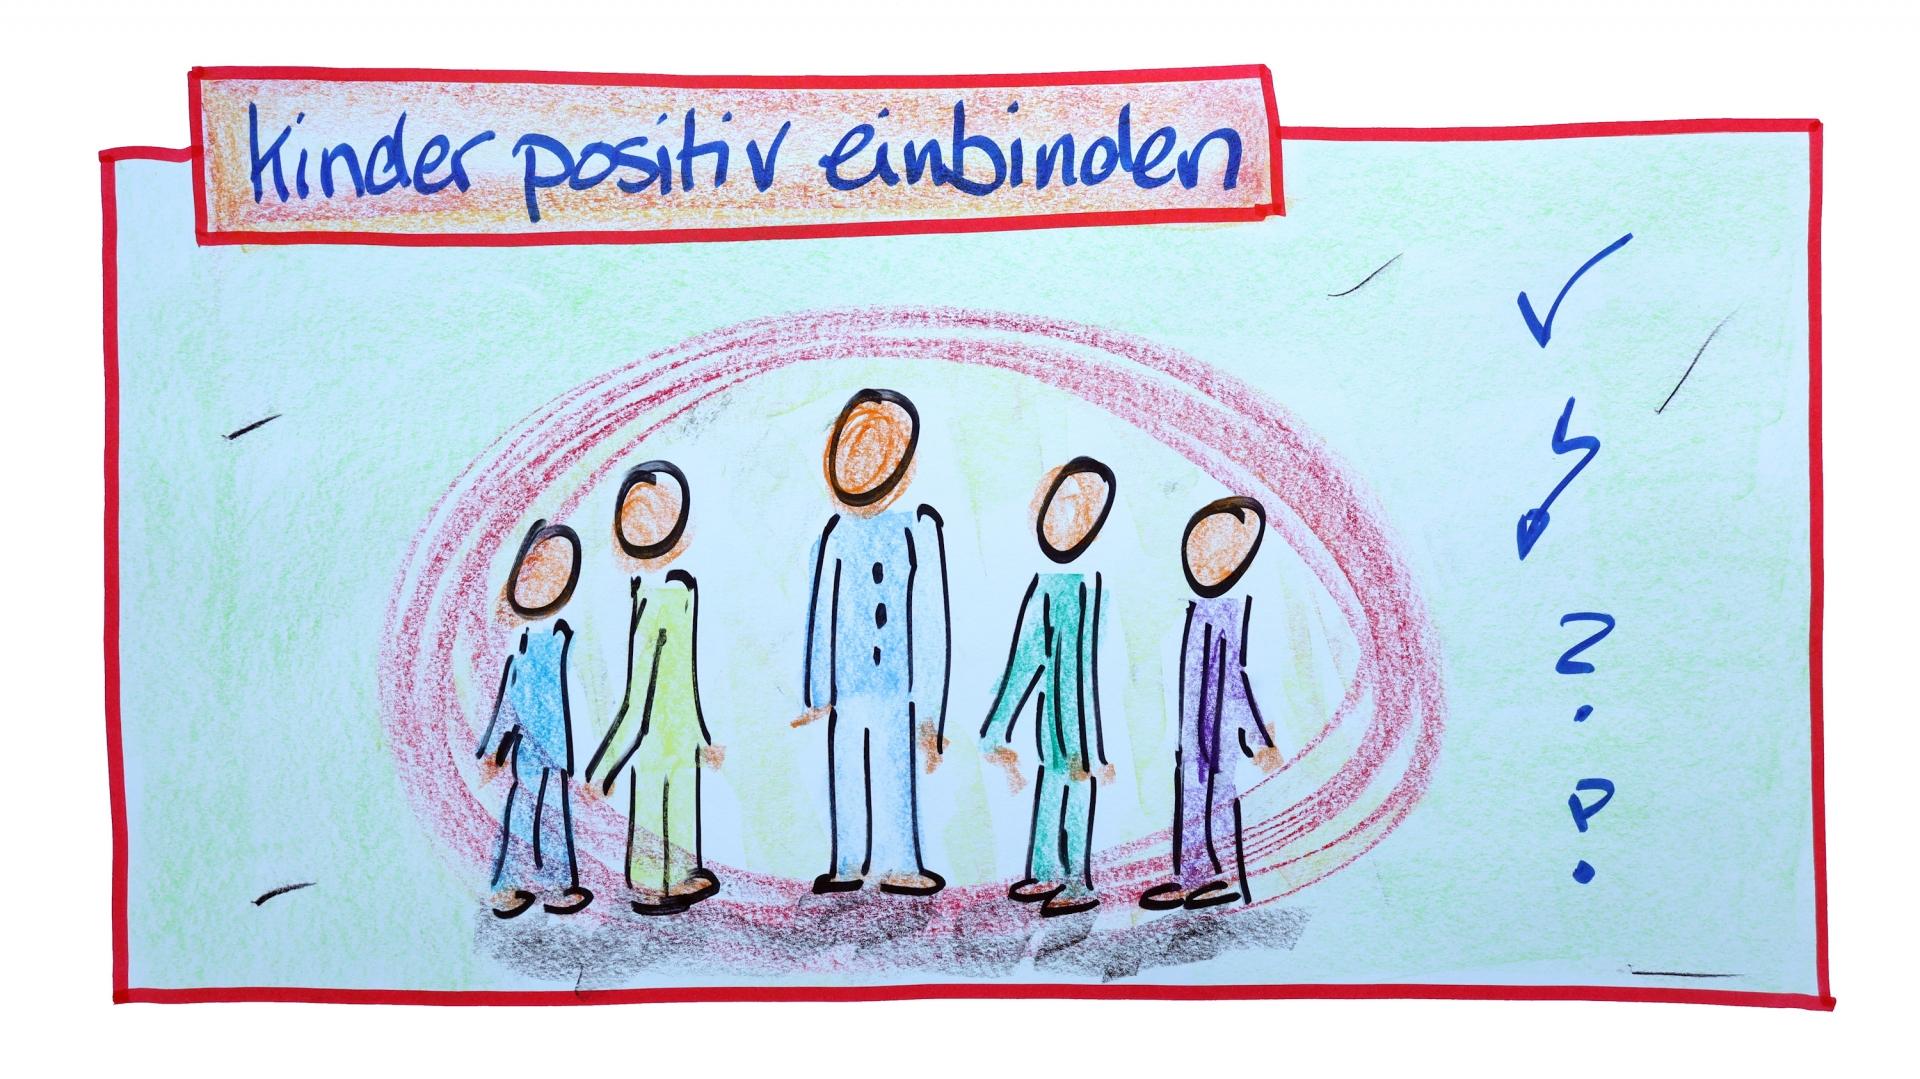 142 – Kinder positiv einbinden